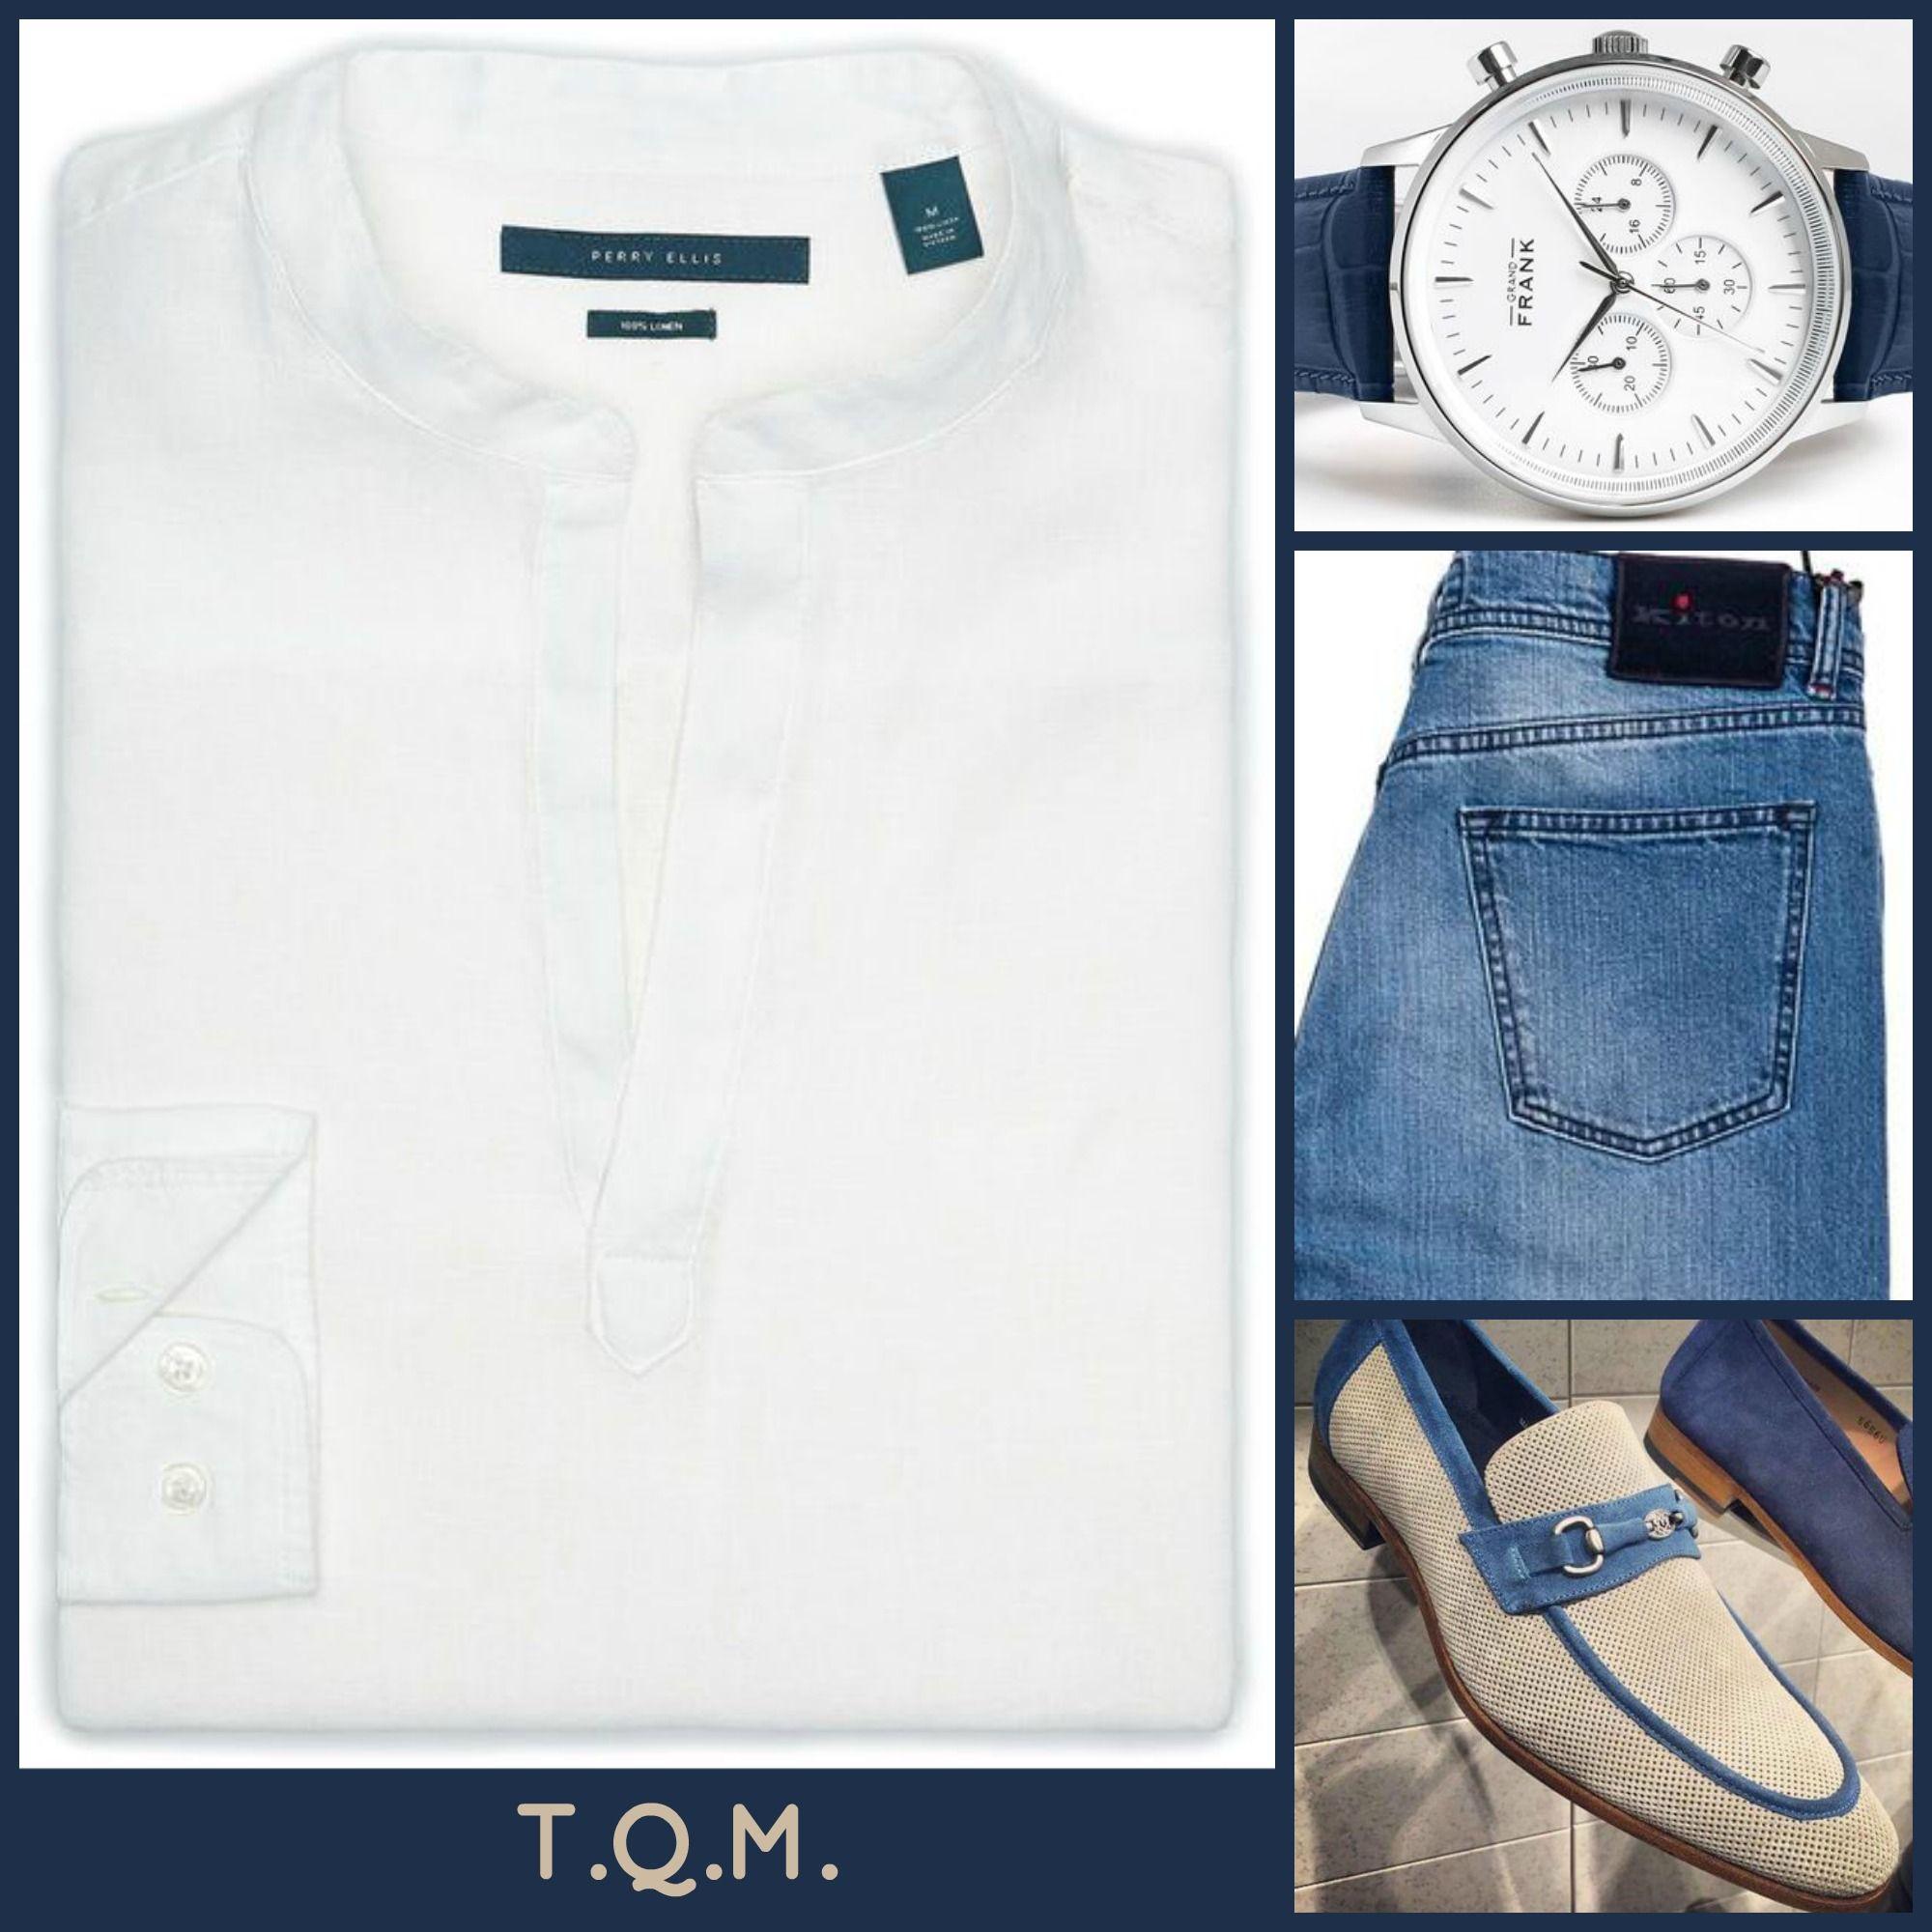 WEEKEND(JEAN STYLE): Perry Ellis(Linen Shirt)-Grand Frank(Watch)-Kiton(Watch)-Mezlan(Shoes)